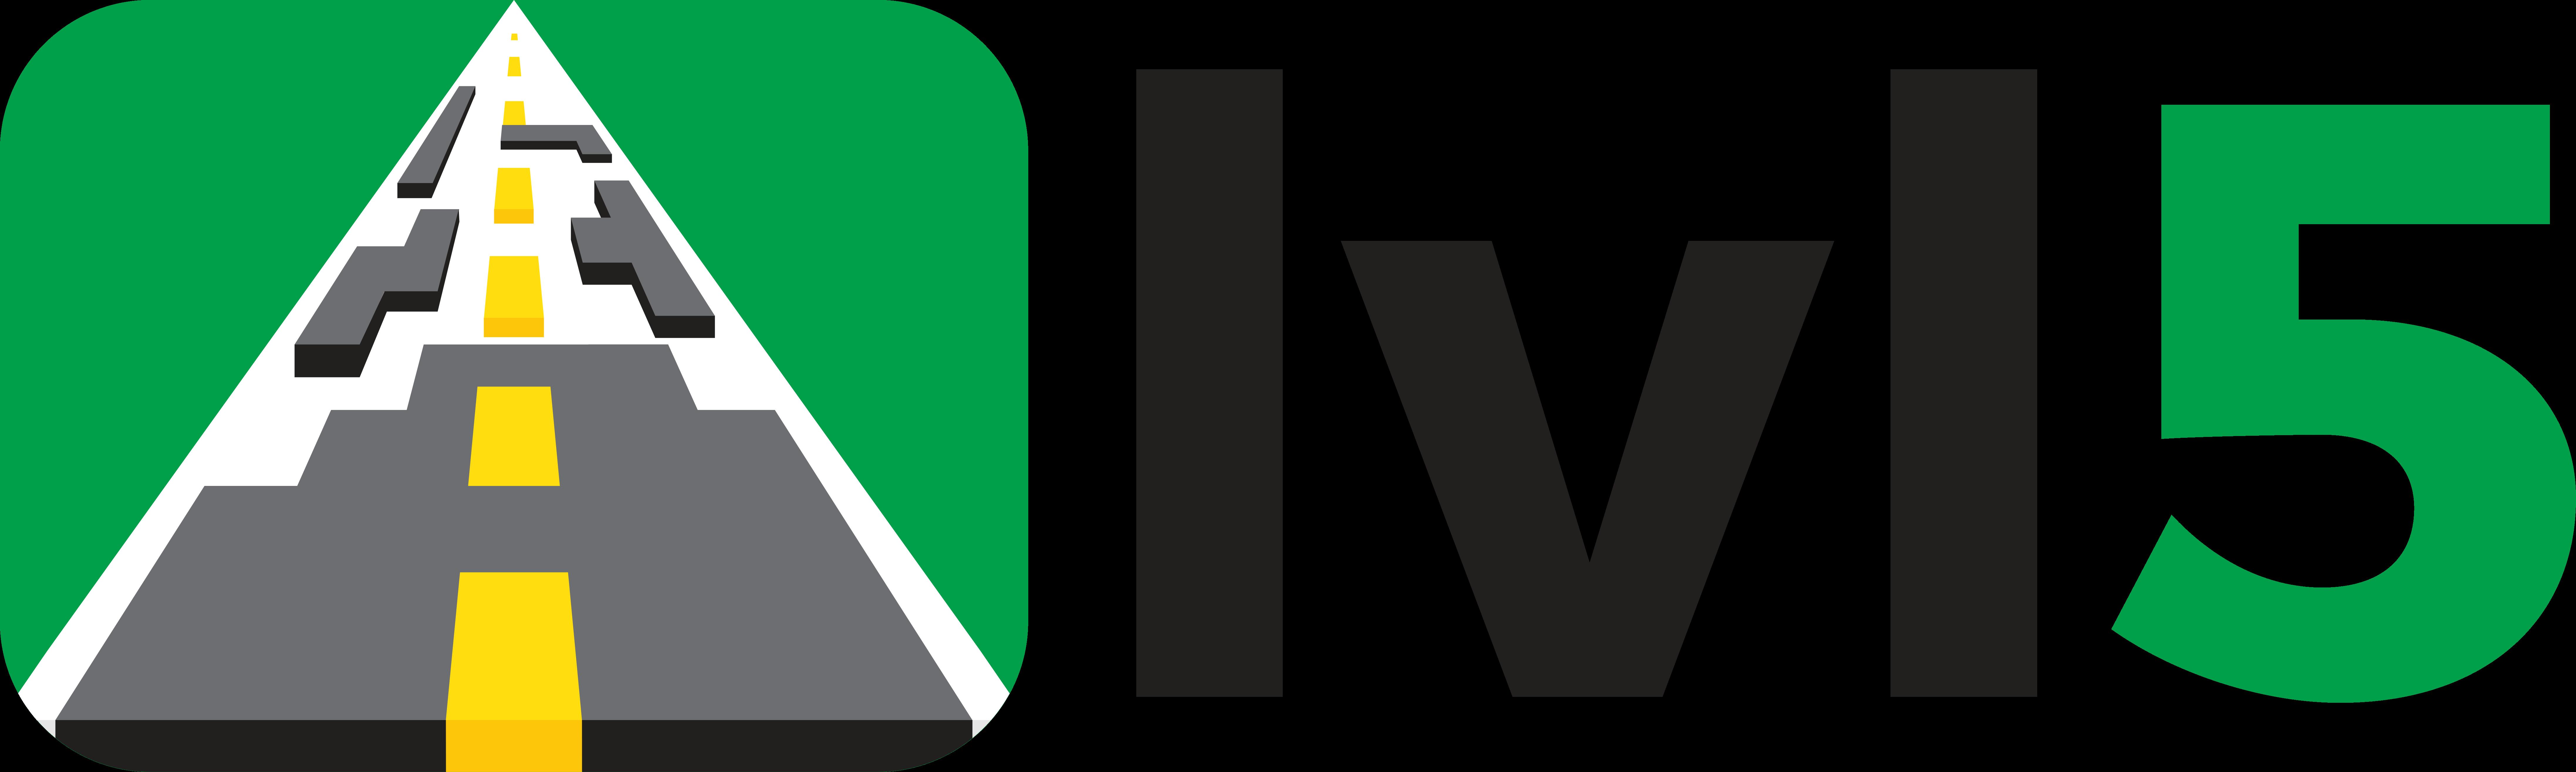 LVL5-Logo-Payver-2017